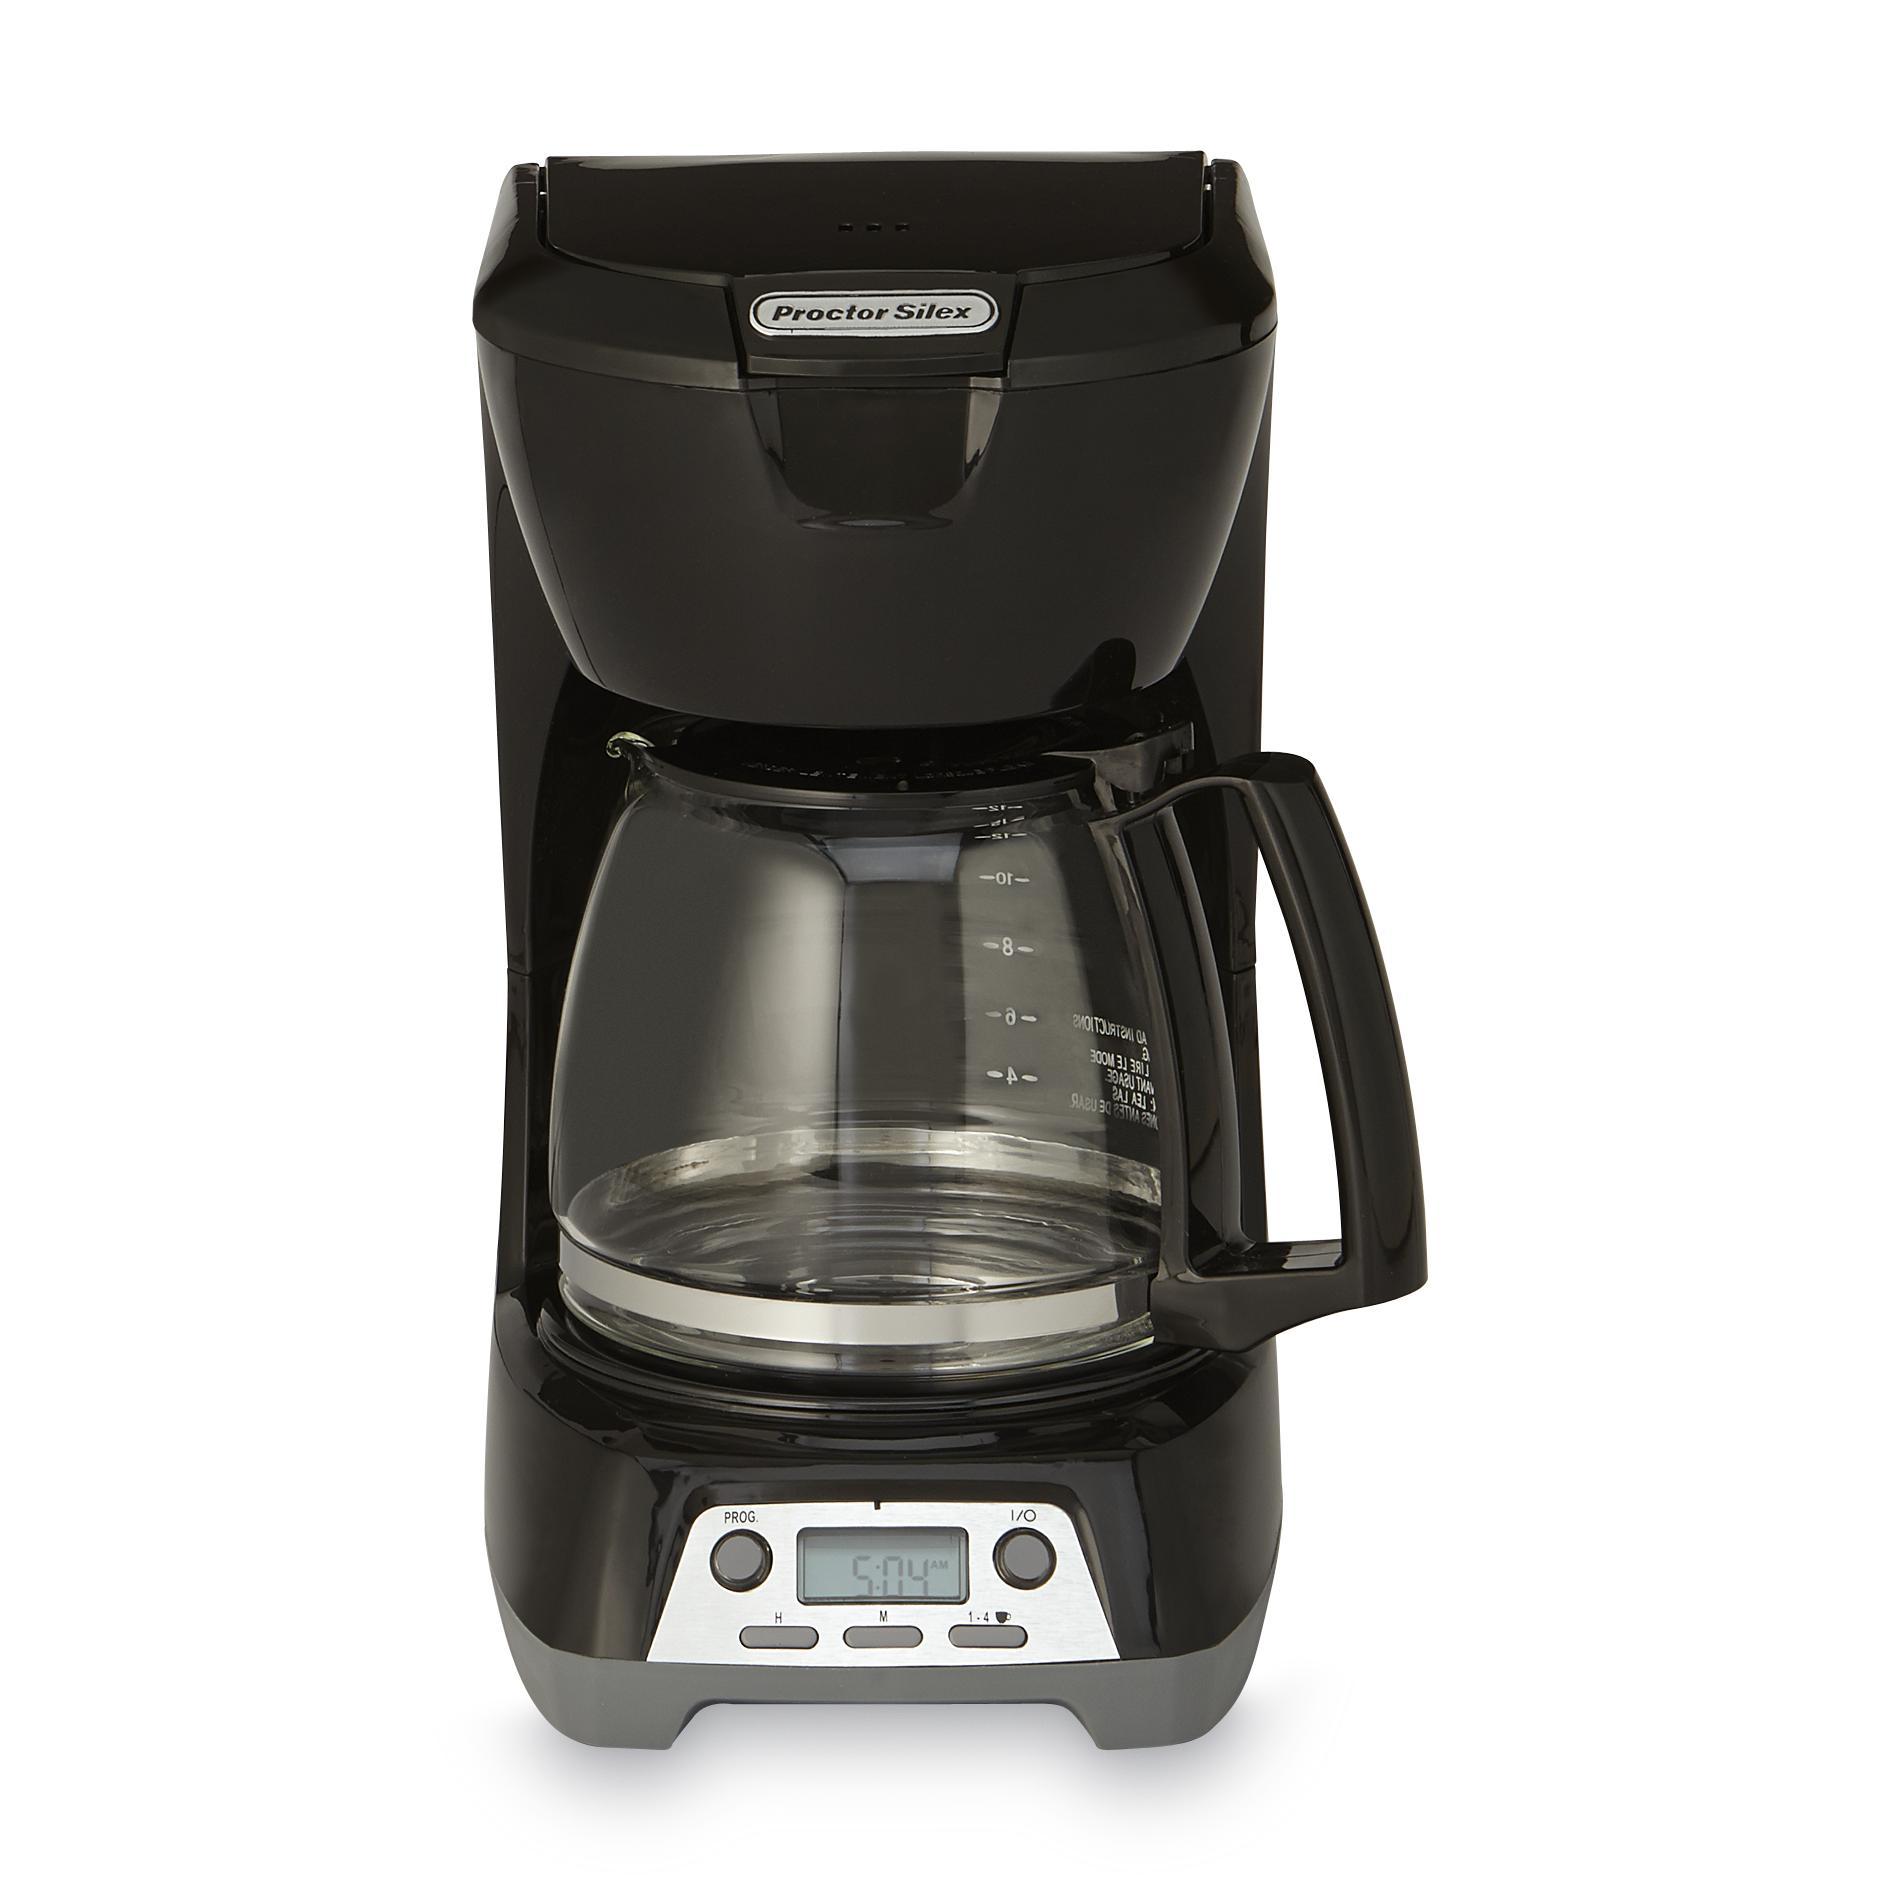 Proctor Silex 43672 12-cup Programmable Digital